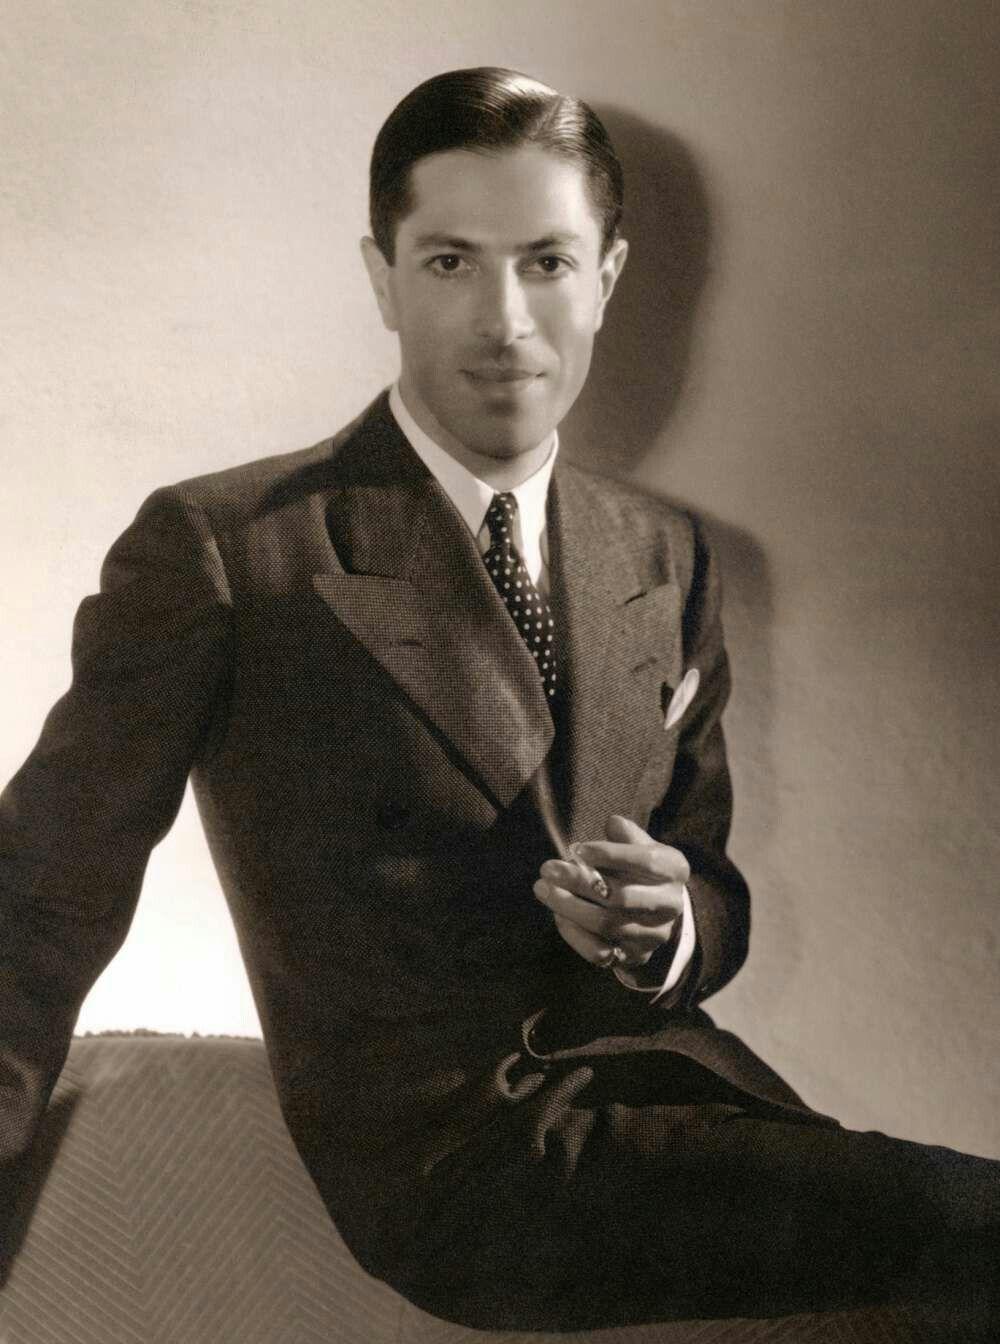 Baron Nicolas de Gunzburg, 1904 - 1981